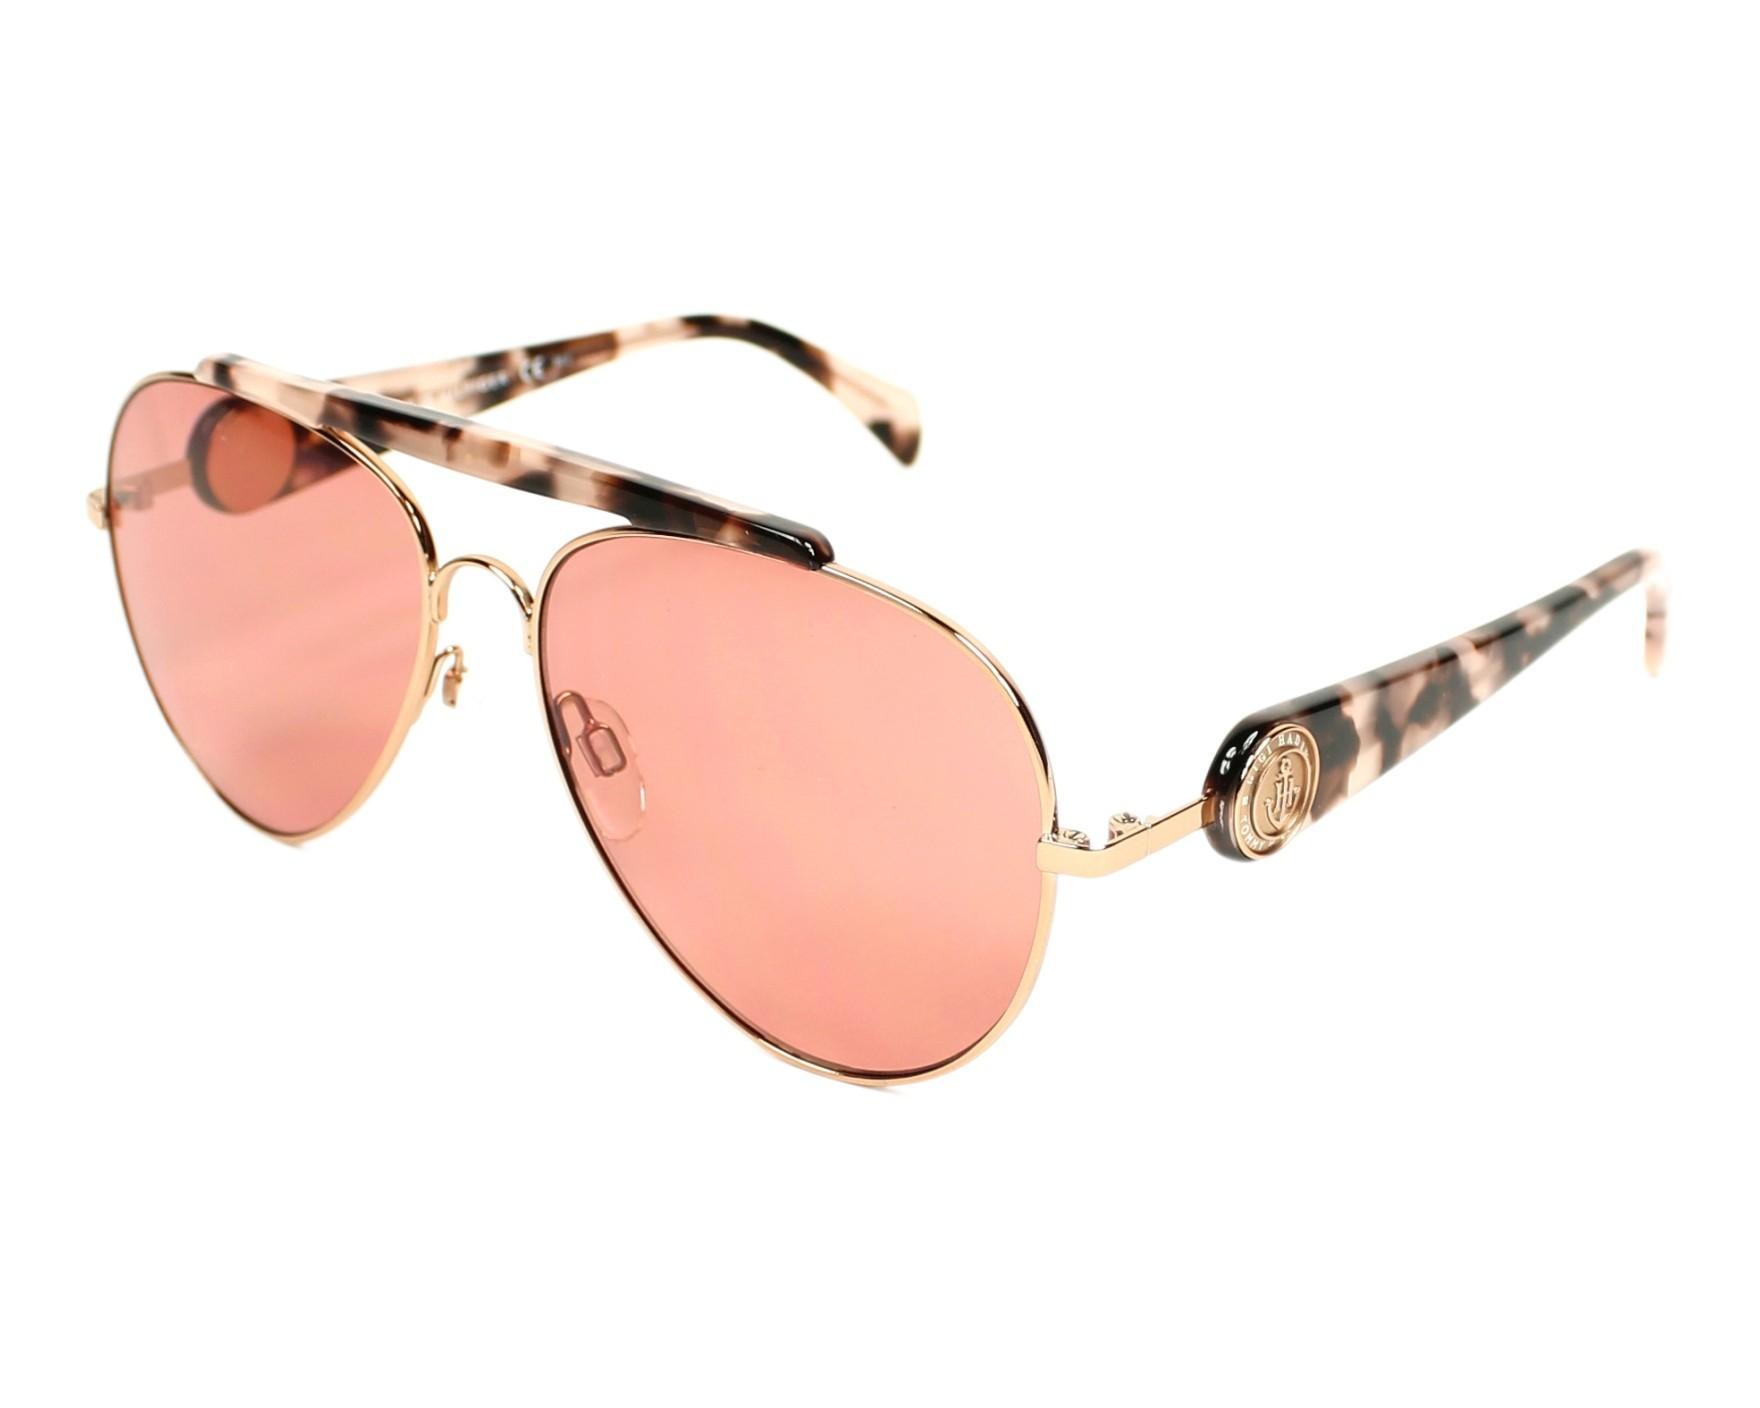 Tommy Hilfiger TH GIGI P80 Sonnenbrille gR6Vx